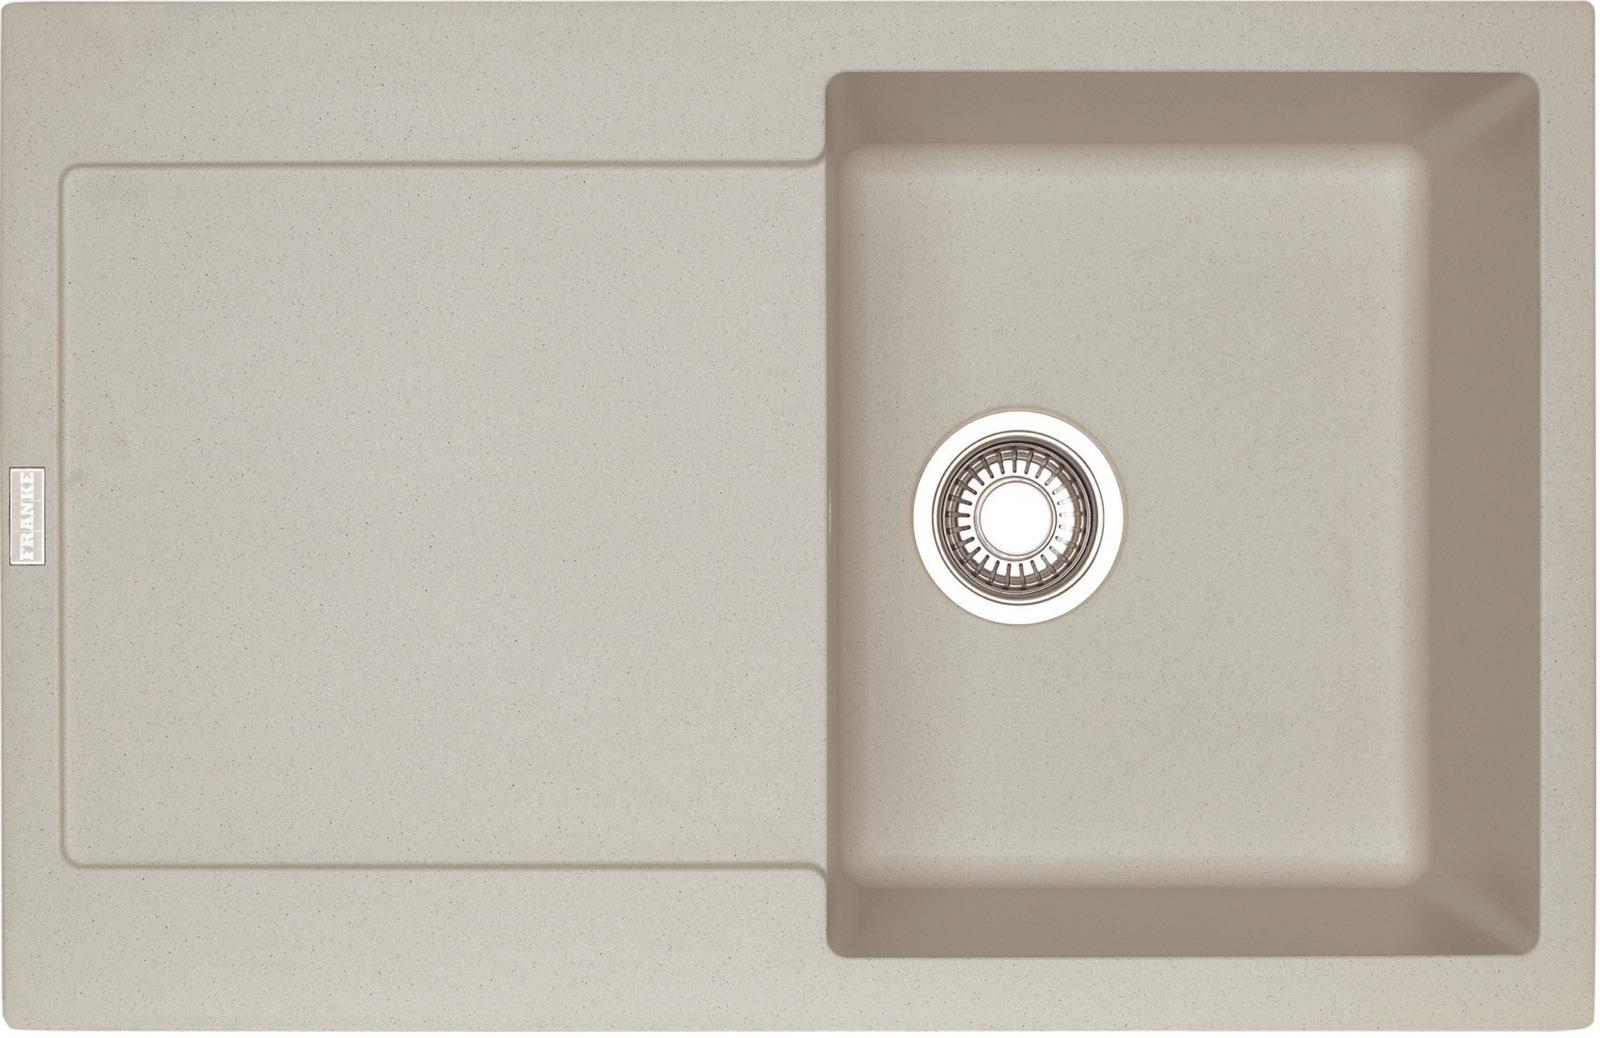 Chiuveta bucatarie fragranite Franke Maris MRG 611 reversibila 780x500mm tehnologie Sanitized Sahara imagine sensodays.ro